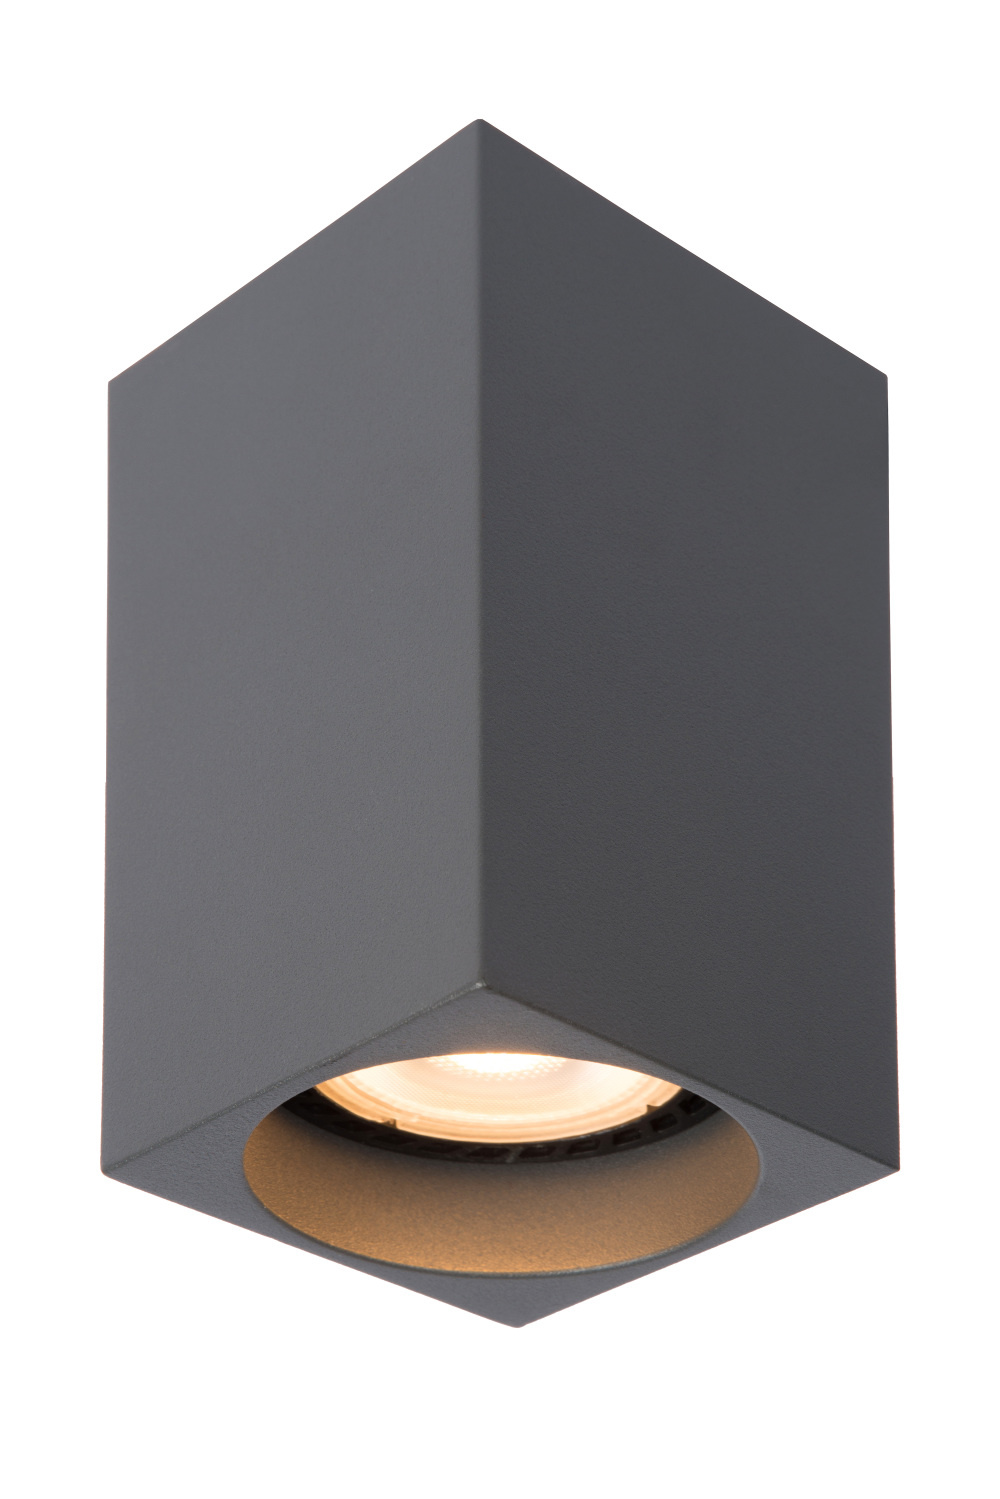 Lucide DELTO LED Spot Vierk. GU10/5W DTW Grijs